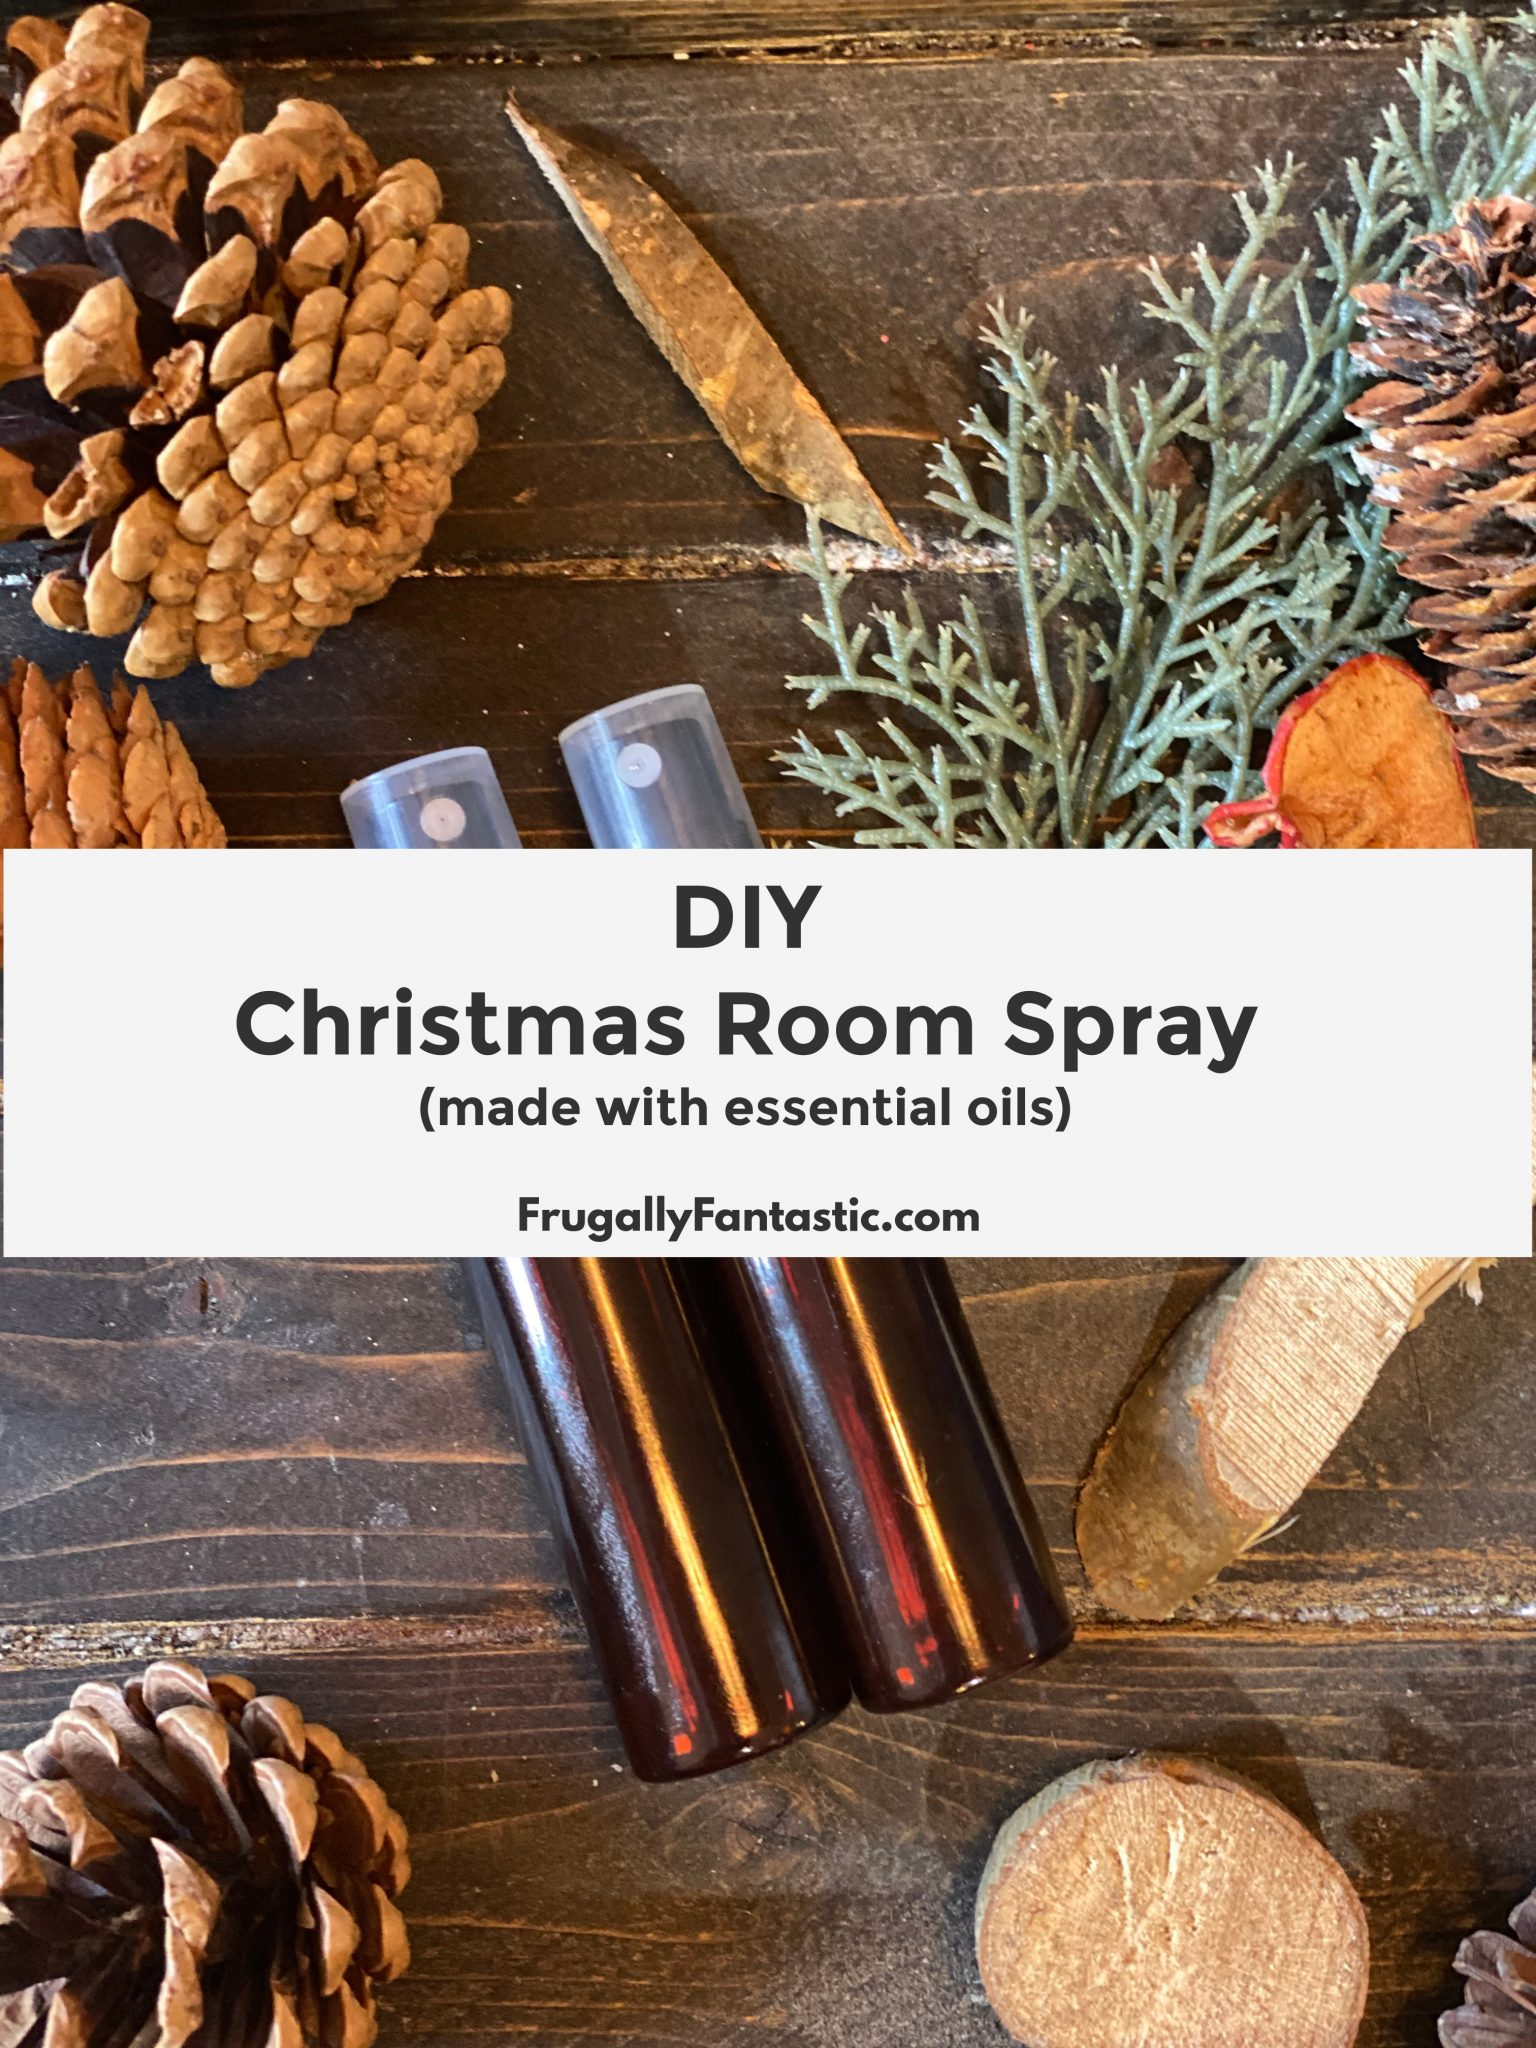 DIY Christmas Room Spray FrugallyFantastic.com